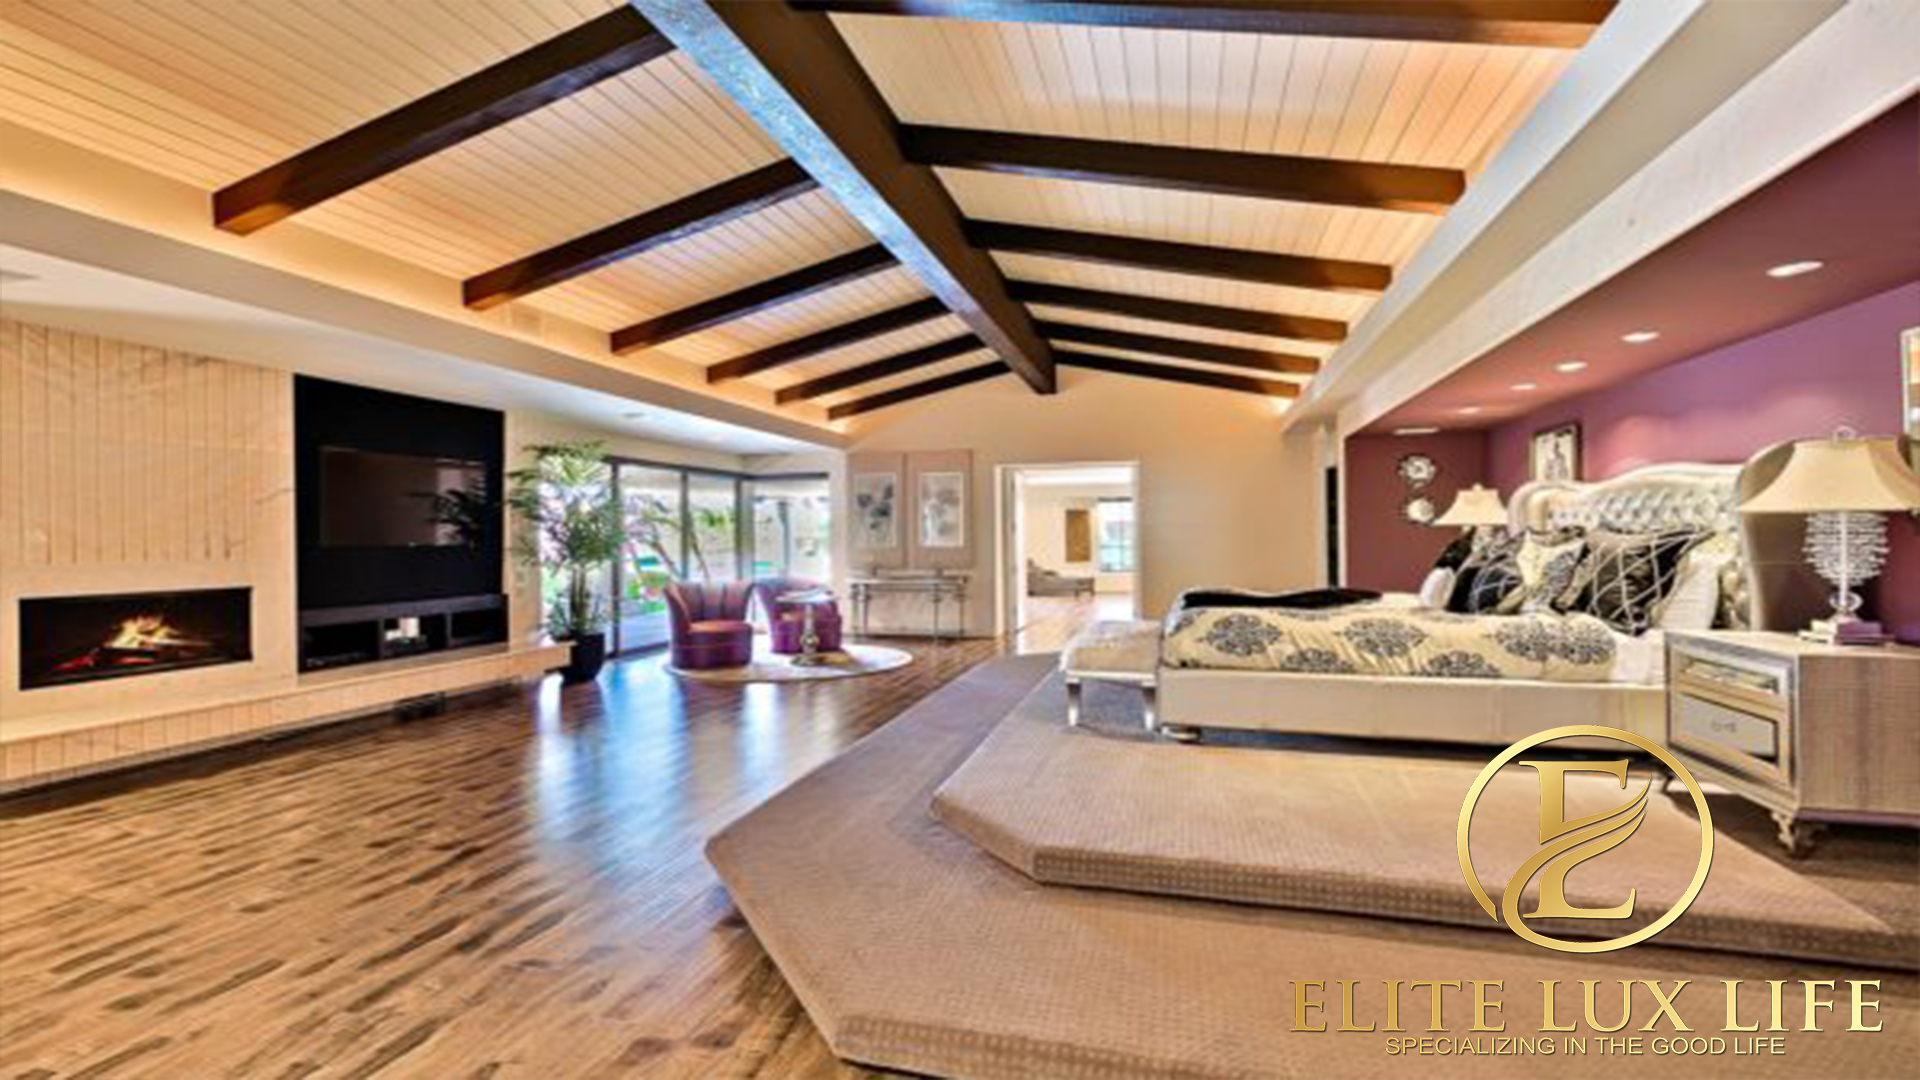 Delgado Elite Lux Estate 16